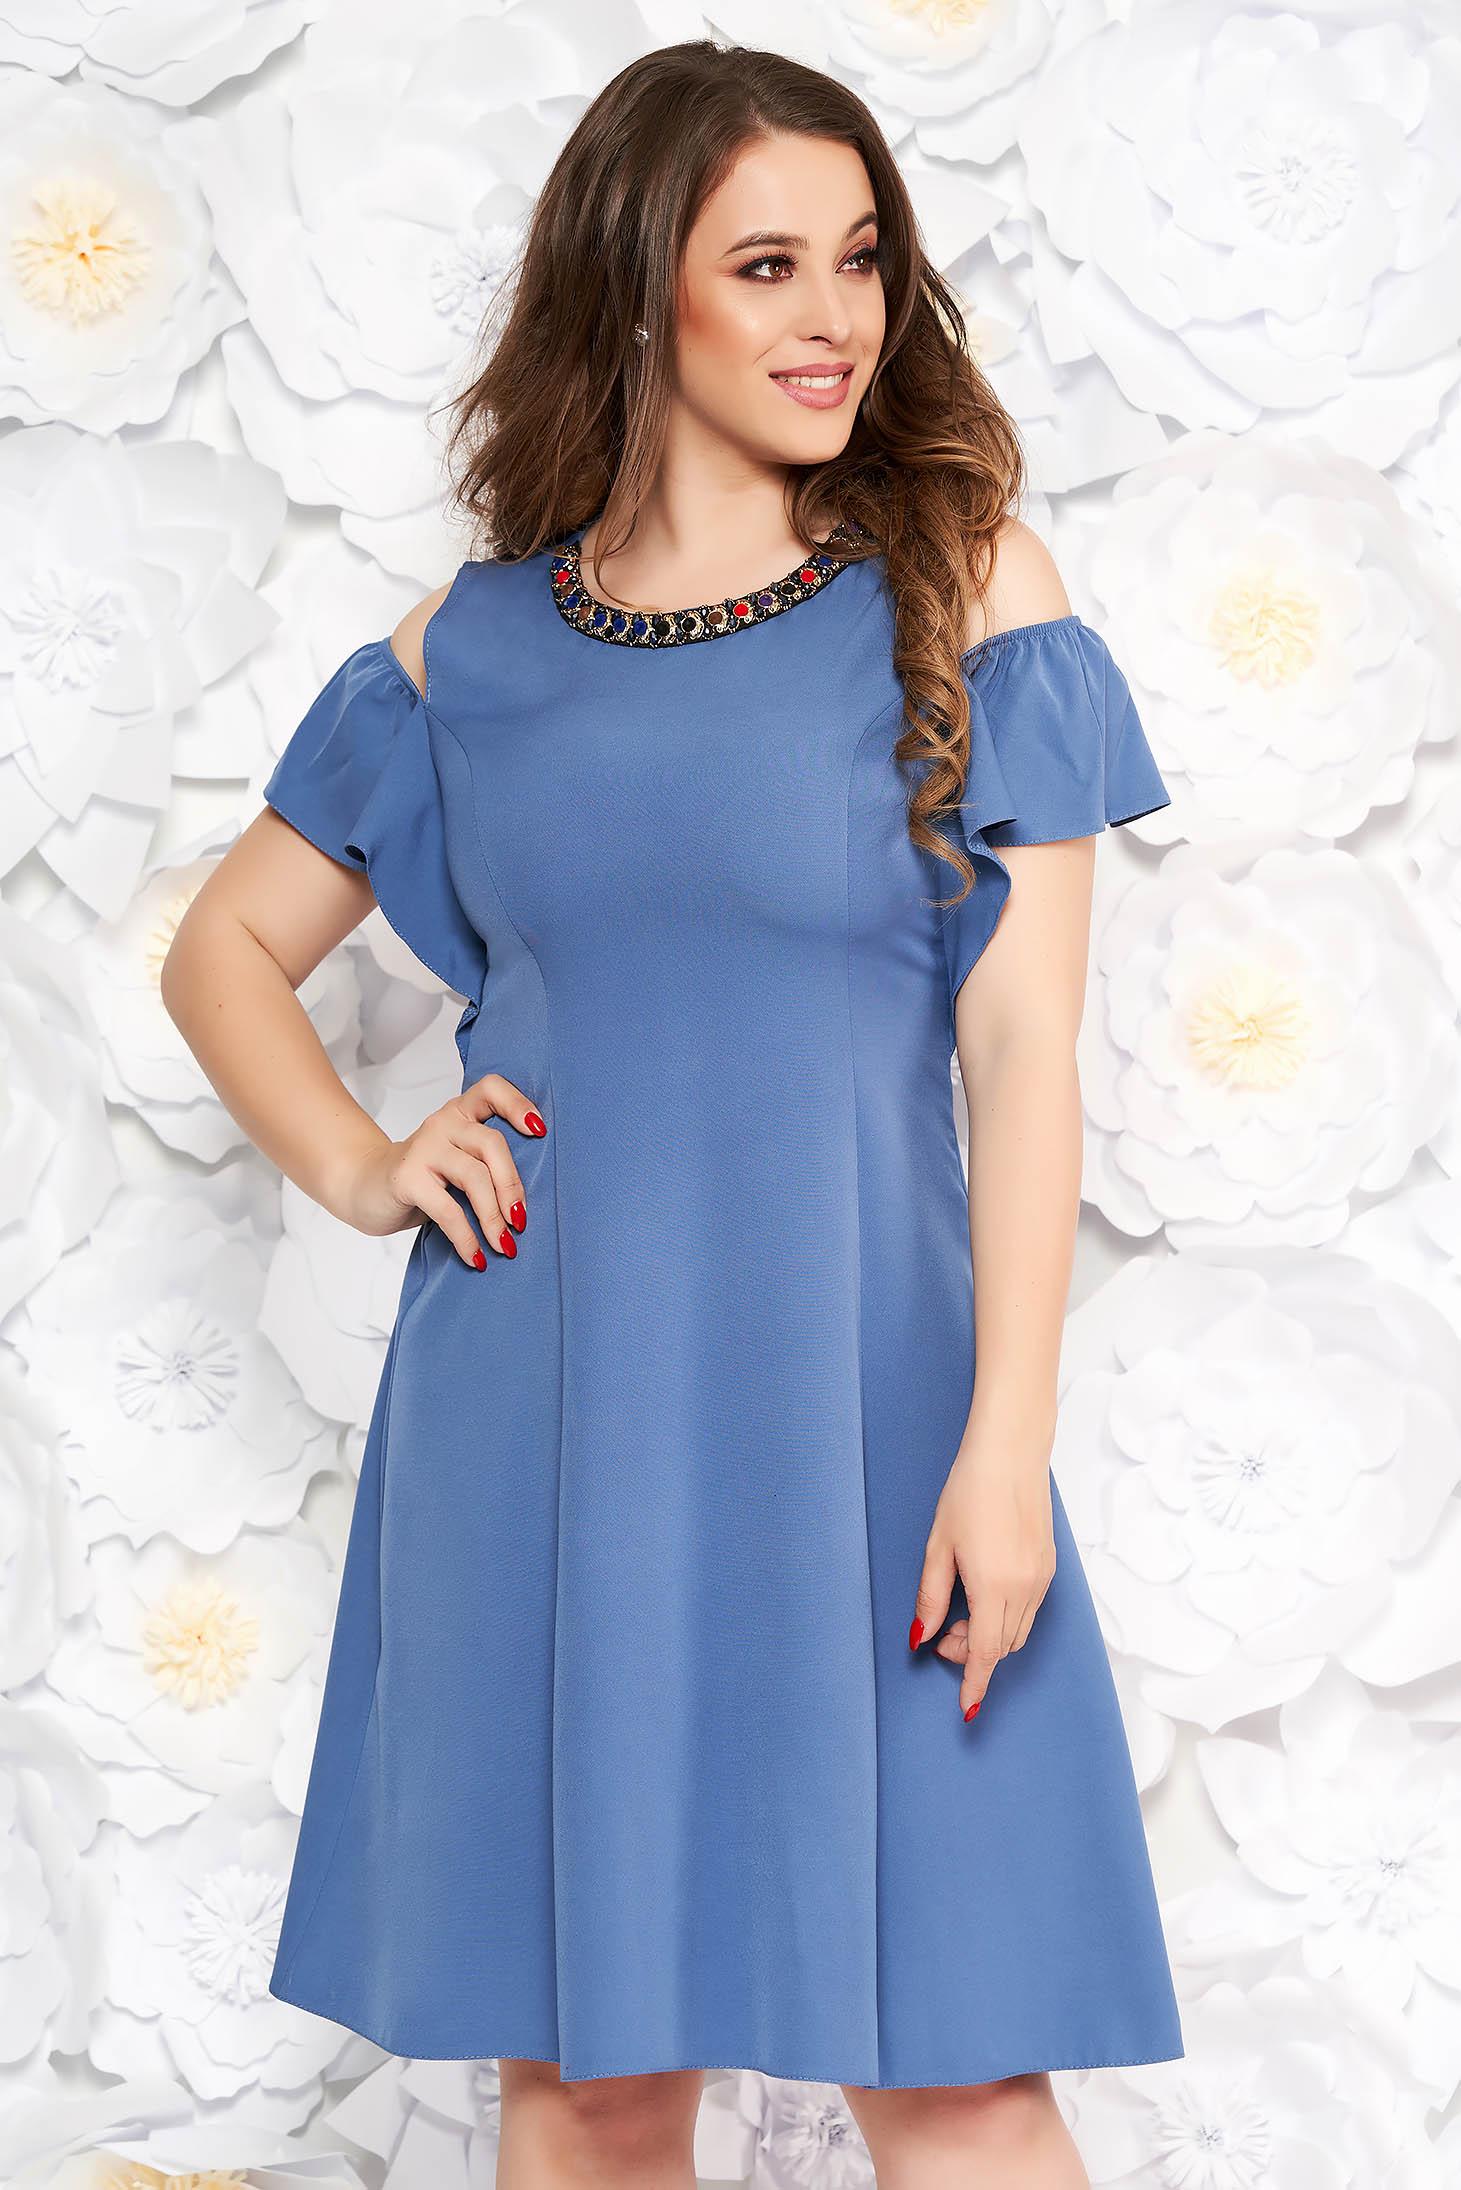 Rochie albastra-deschis de zi in clos din material fin la atingere cu aplicatii metalice si umeri decupati